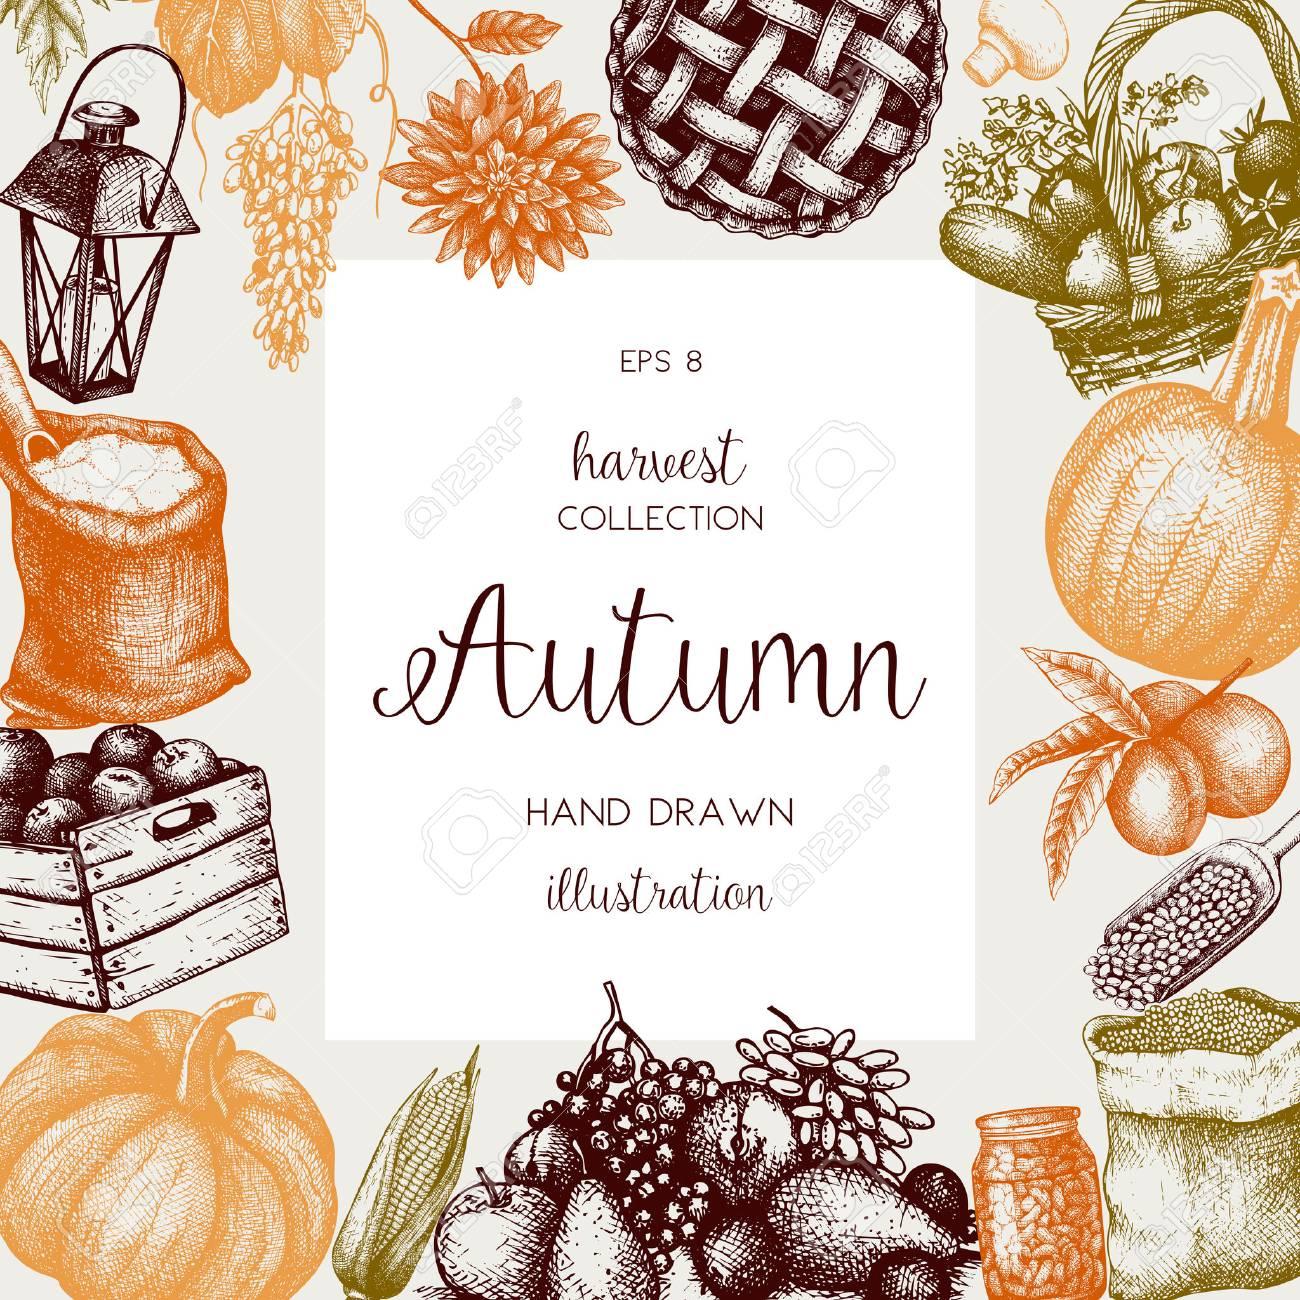 Vintage autumn template. - 76963739